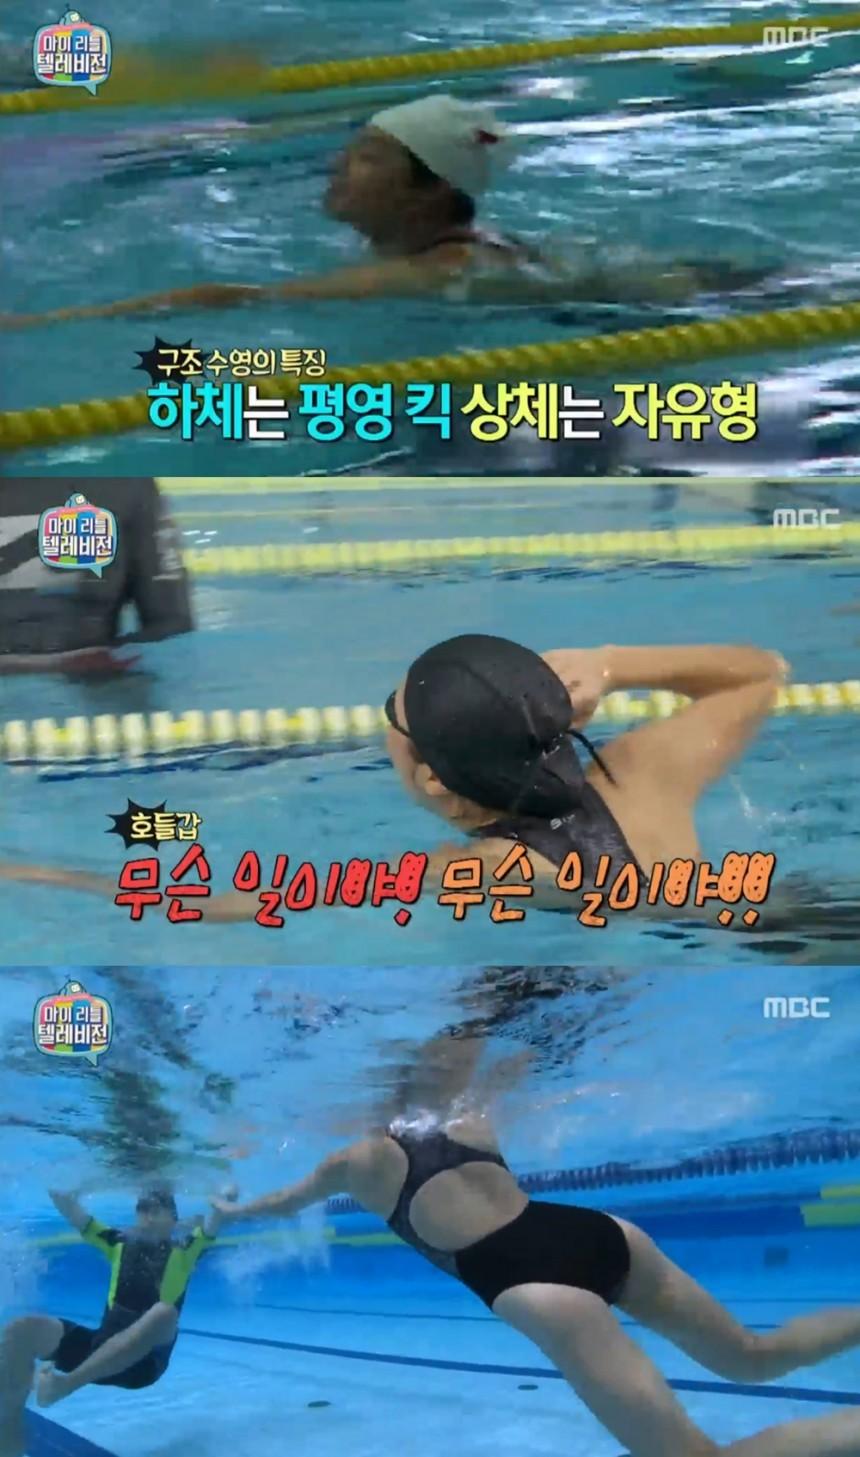 ☆゚・*。.。*・゚・*競泳水着フェチ61枚目*・゚・*。.。*・゜☆ [無断転載禁止]©bbspink.comYouTube動画>37本 ->画像>706枚